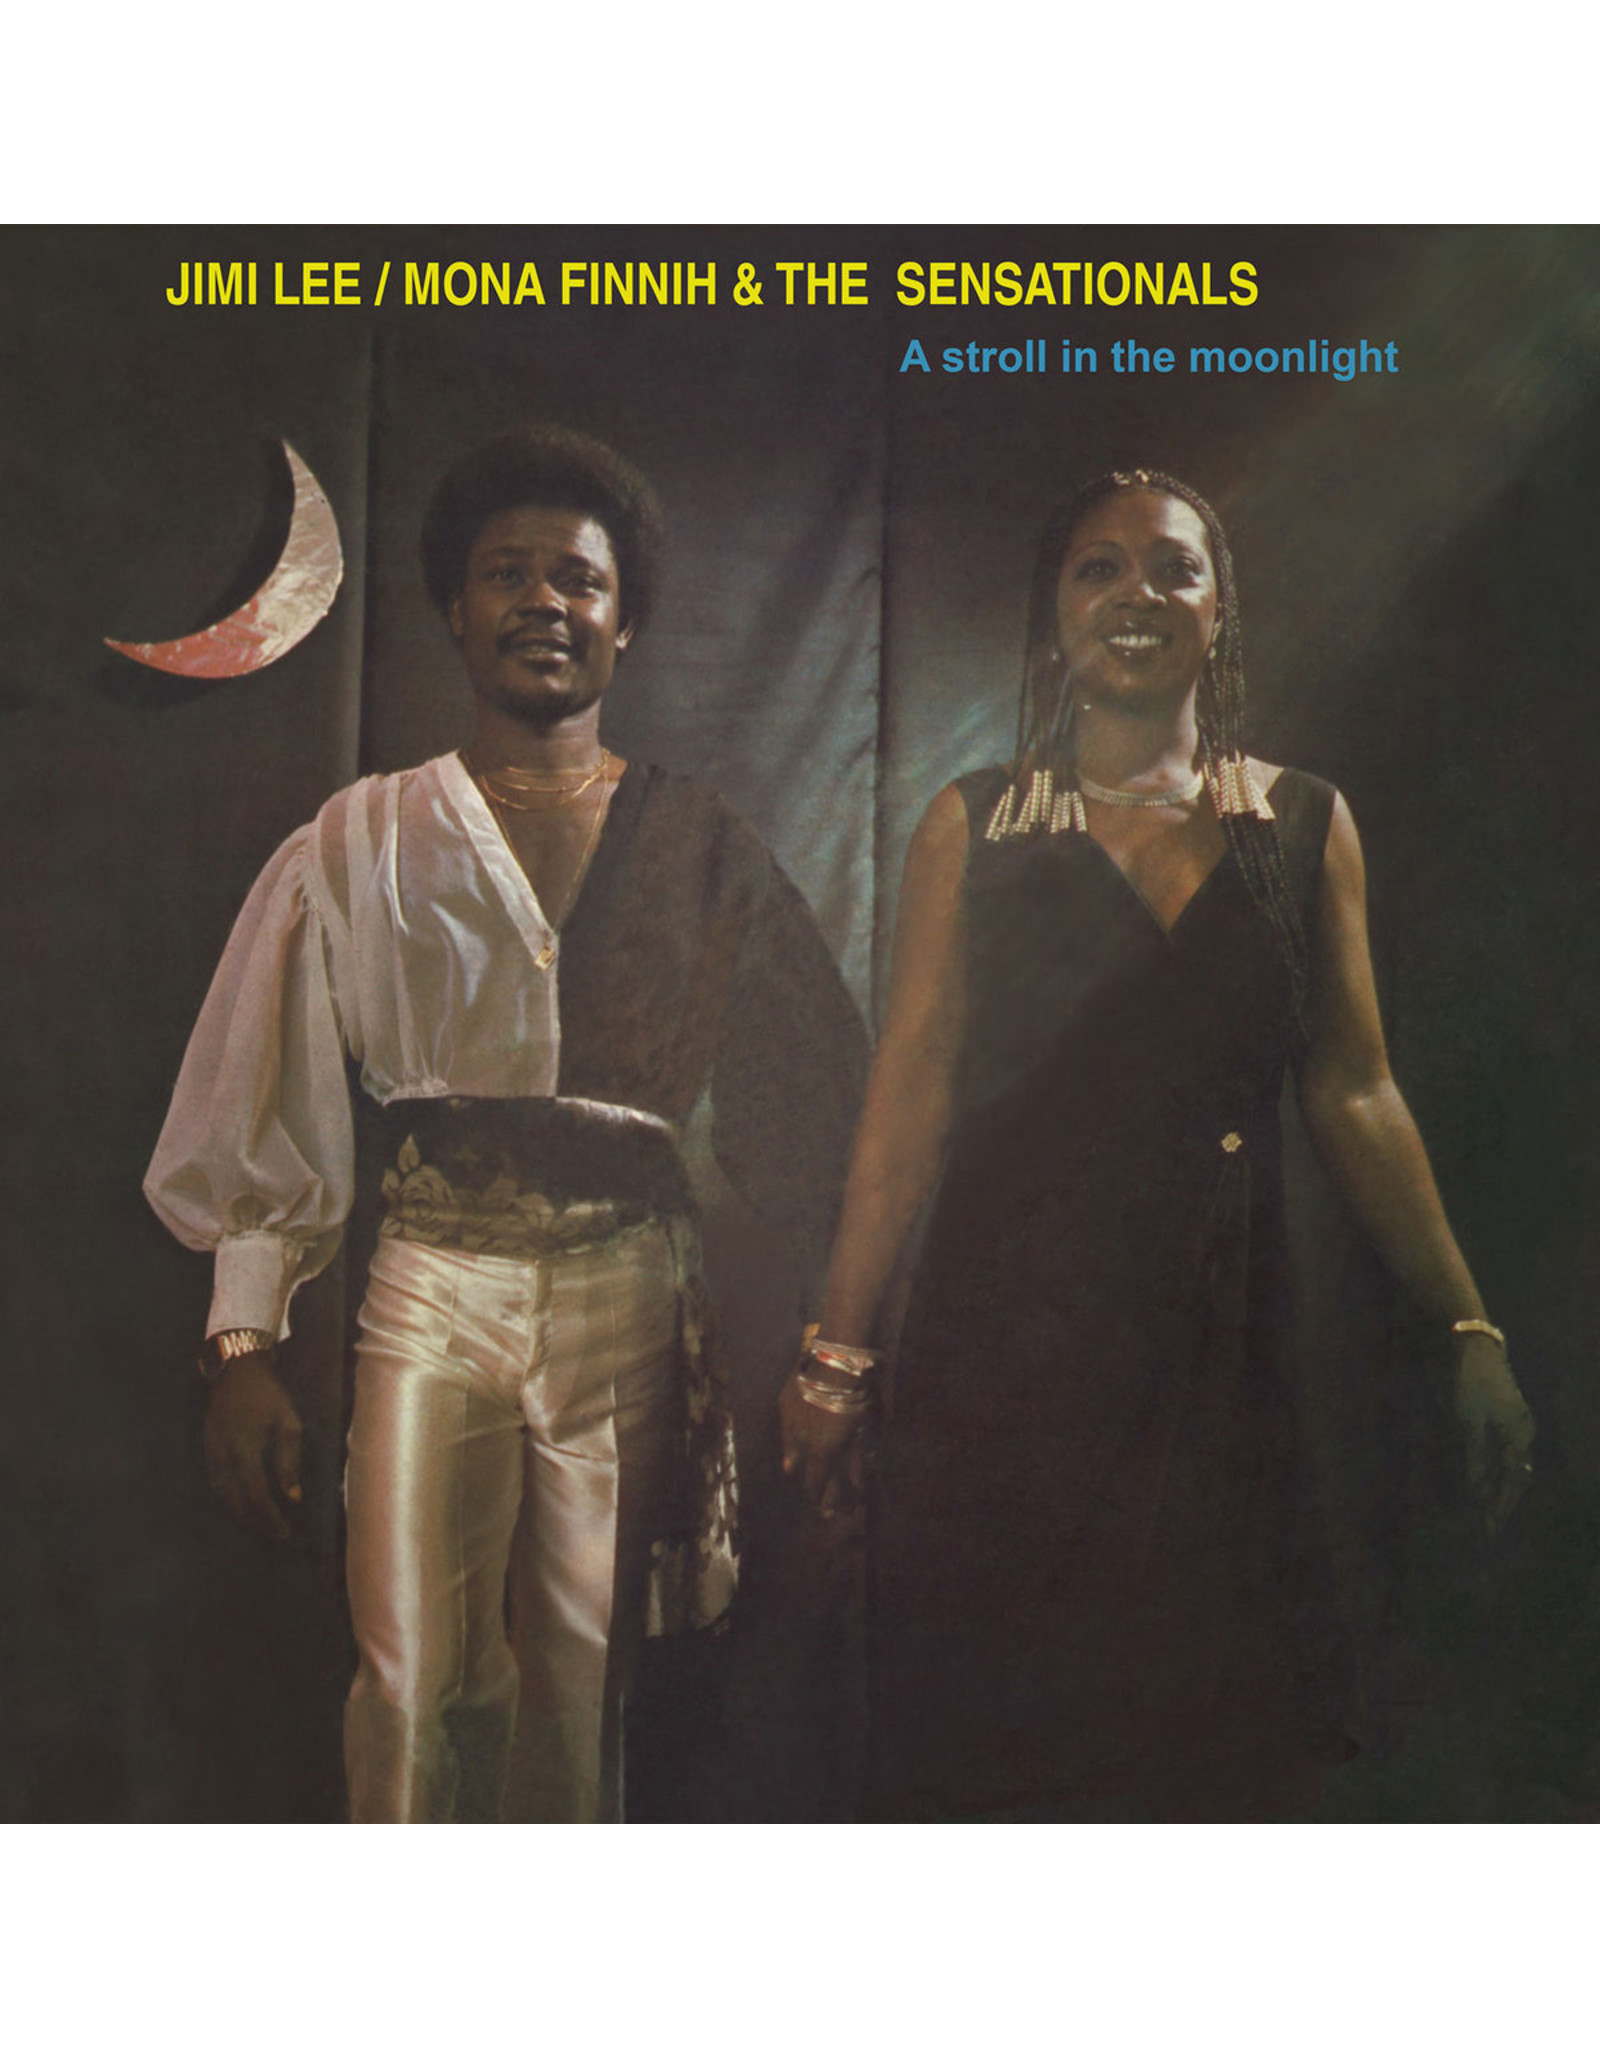 New Vinyl Jimi Lee / Mona Finnih & The Sensationals - A Stroll In The Moonlight LP